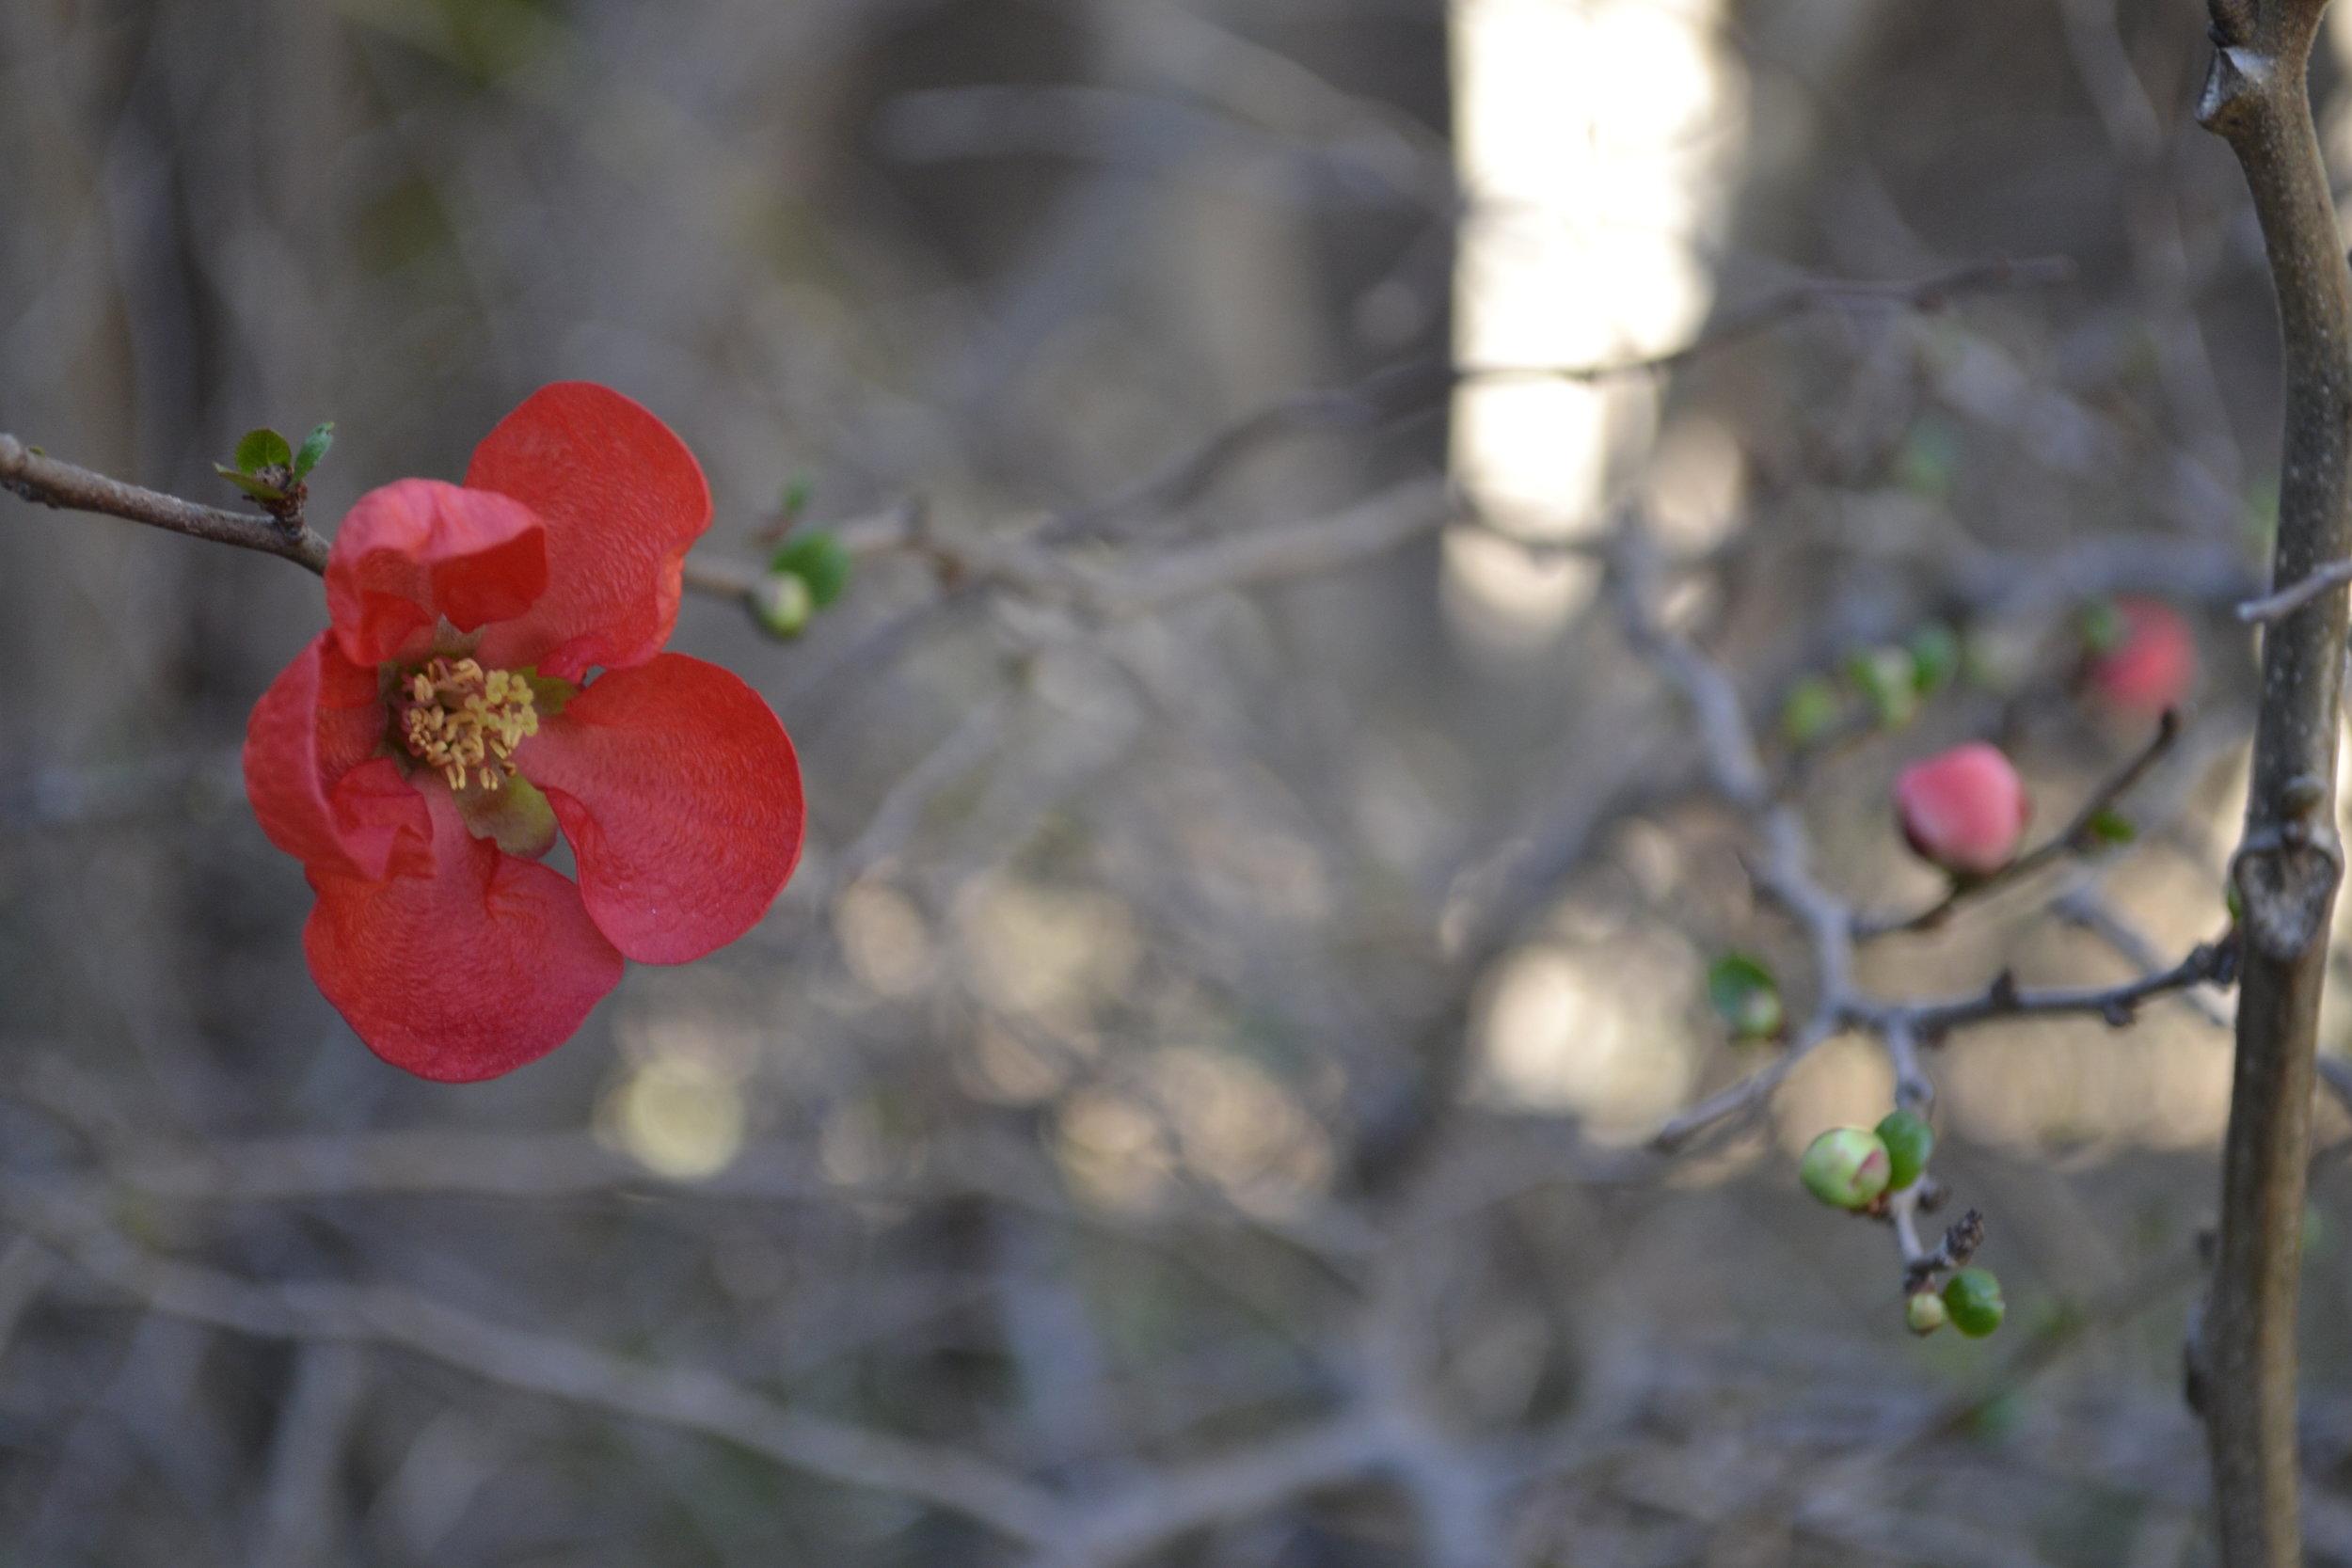 Ft Worth Botanical Garden (photo: Andy Bruner)